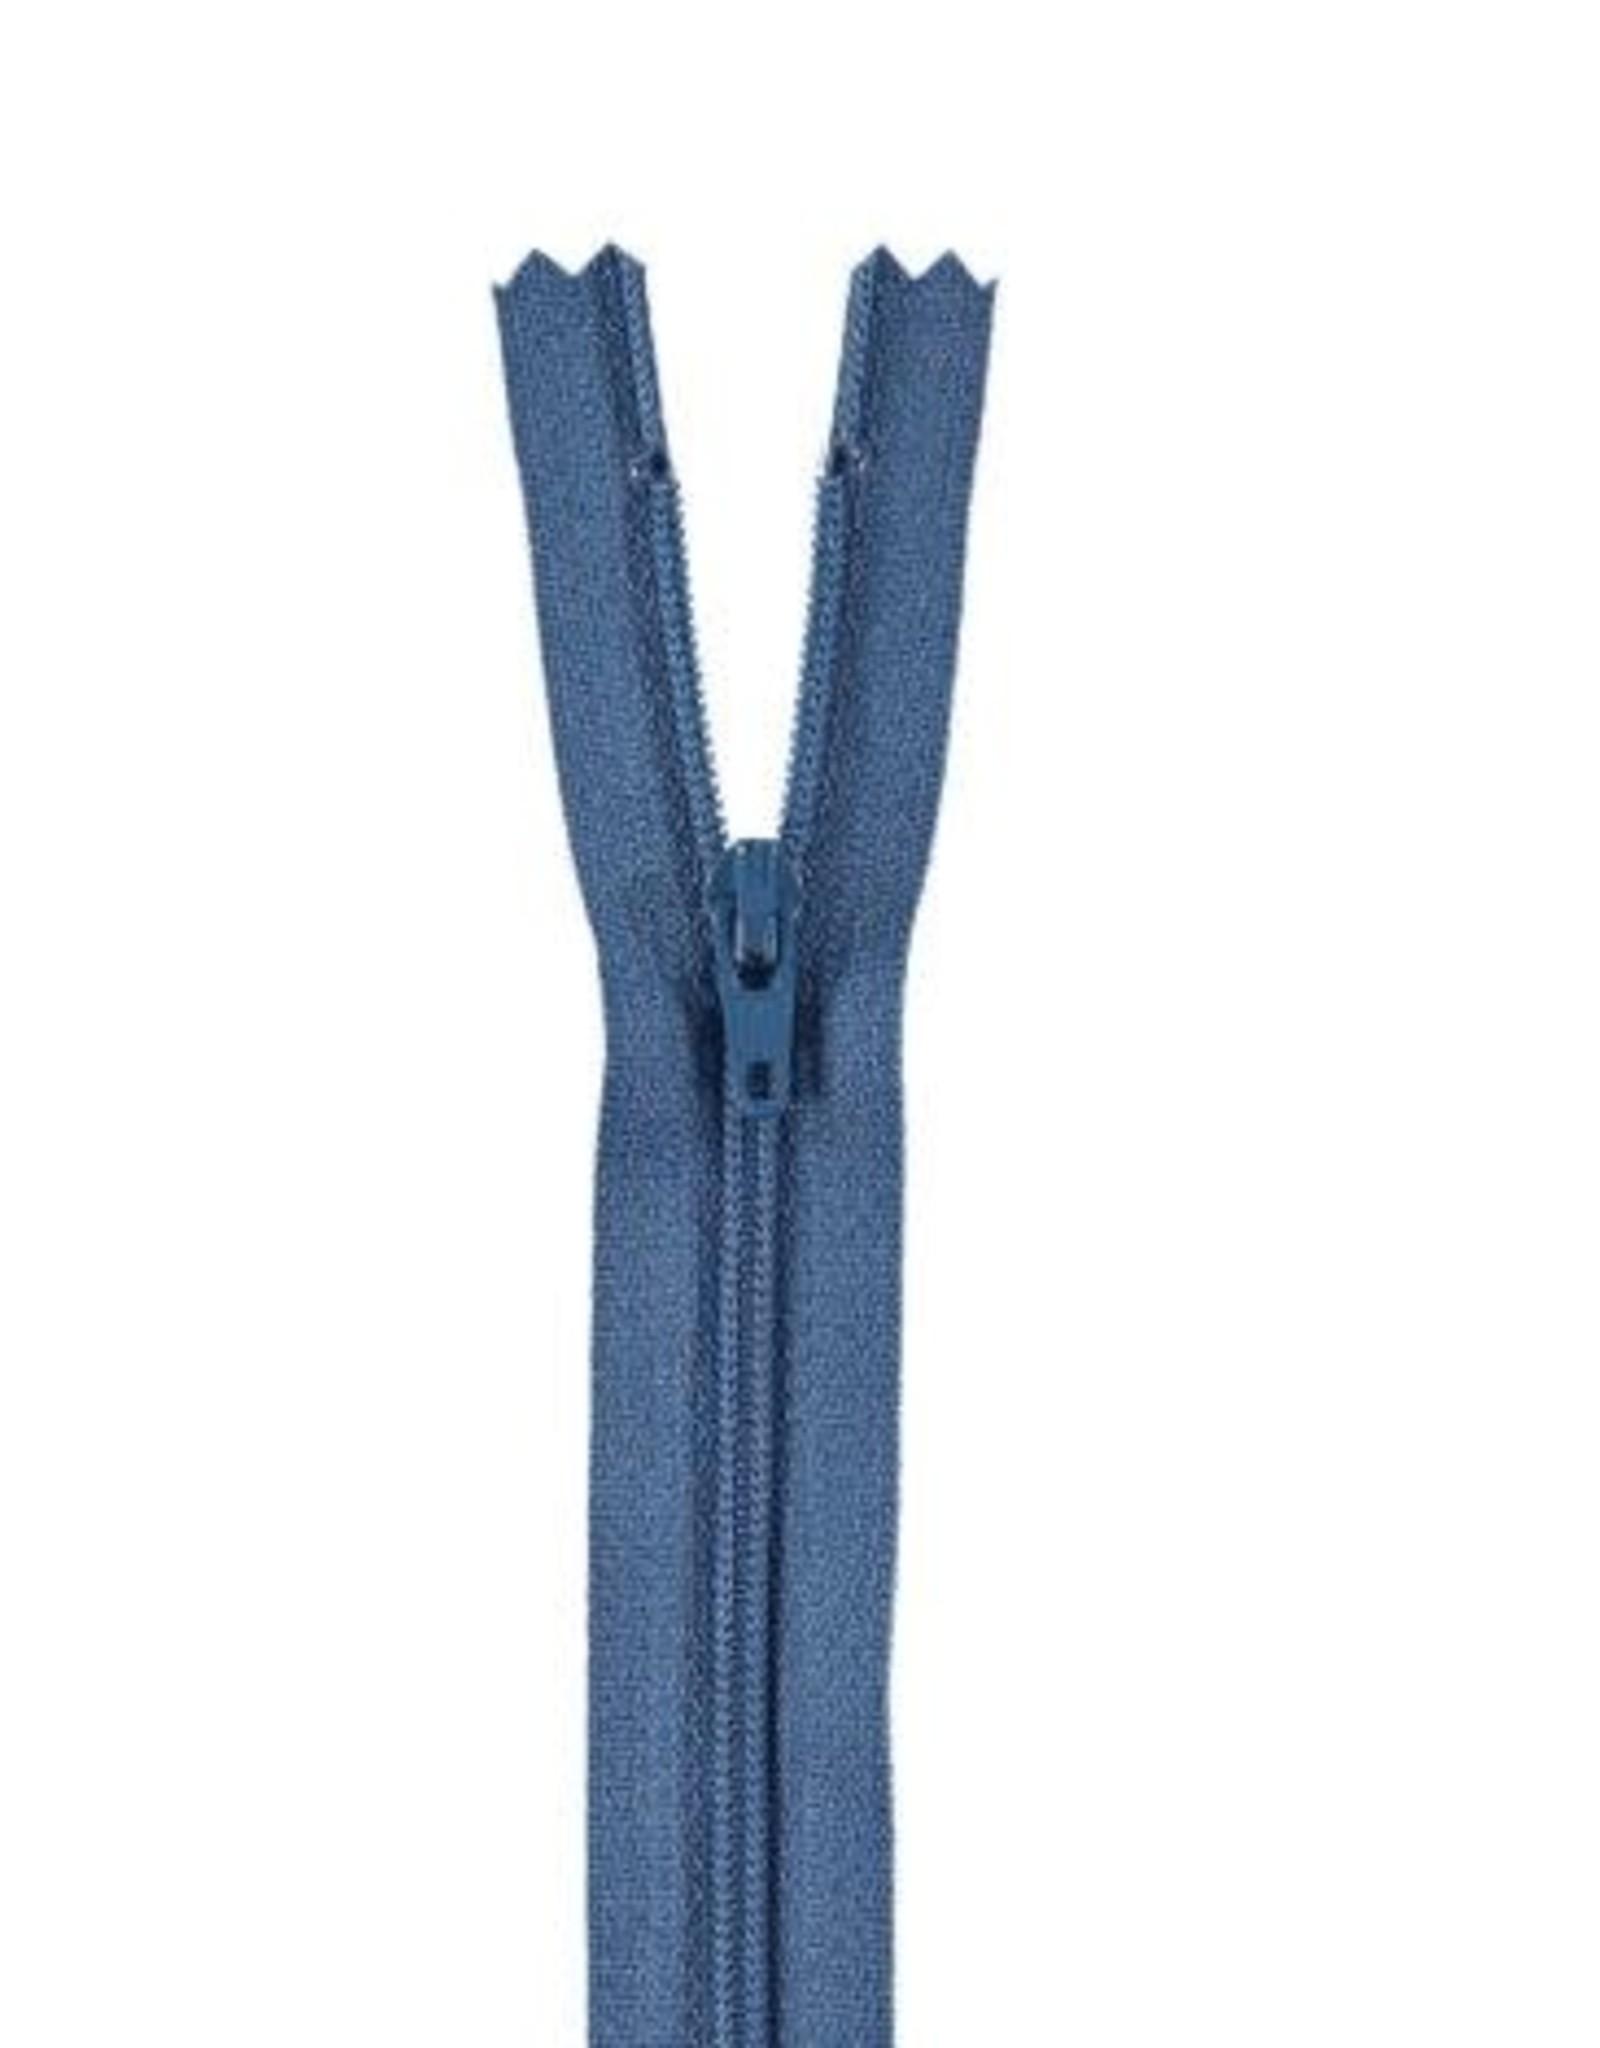 YKK Spiraalrits niet-DB 3mm jeansblauw 839-25cm